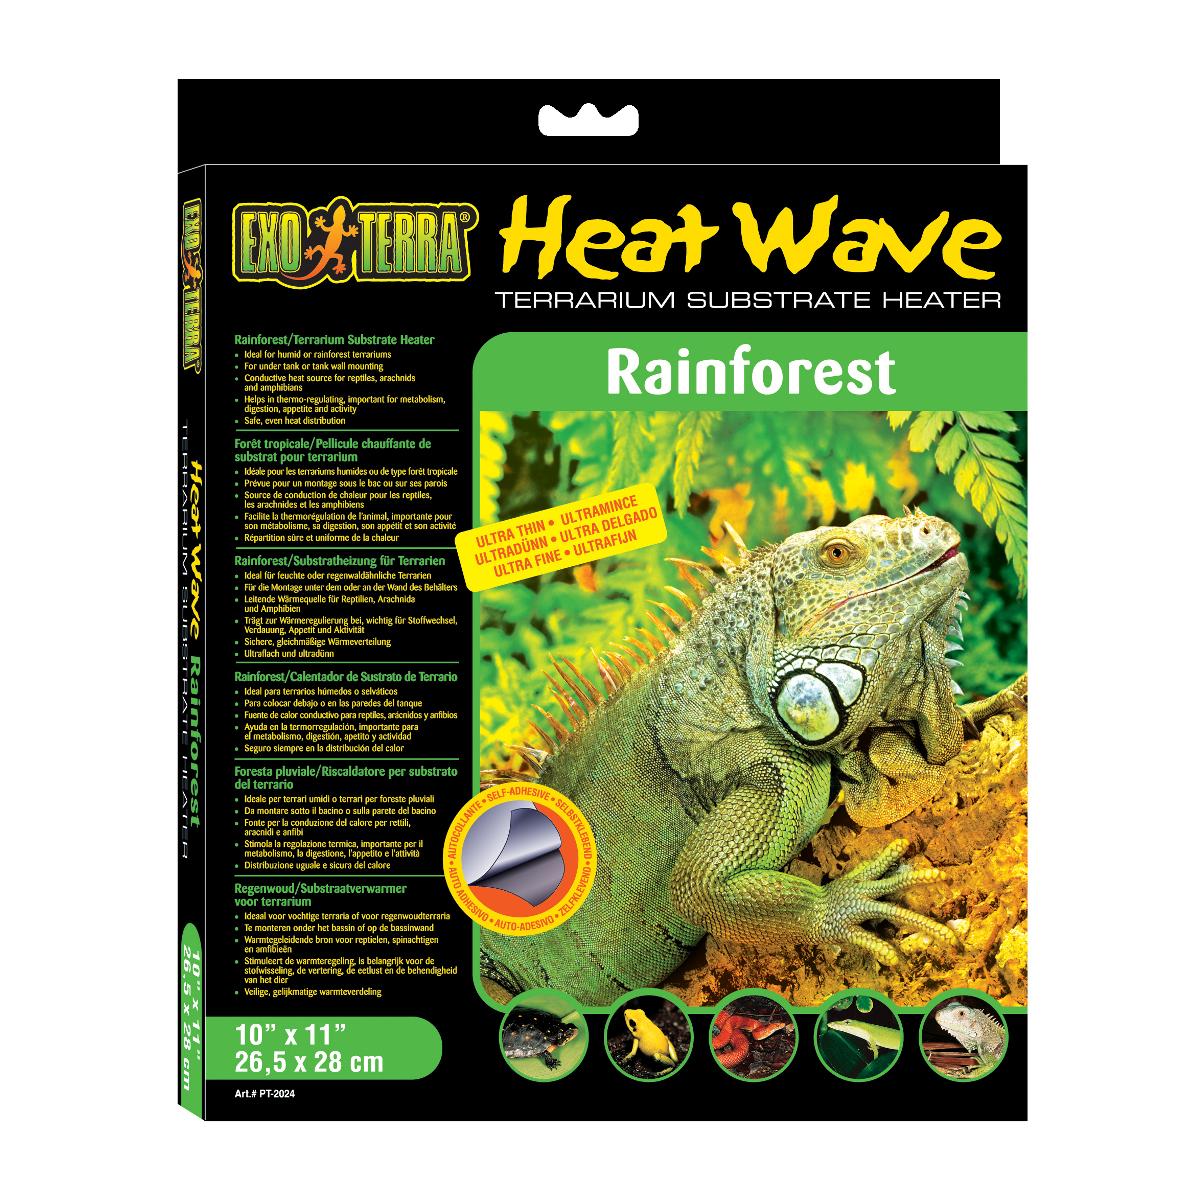 Deska topná EXO TERRA Heat Wave Rainforest střední 8 W